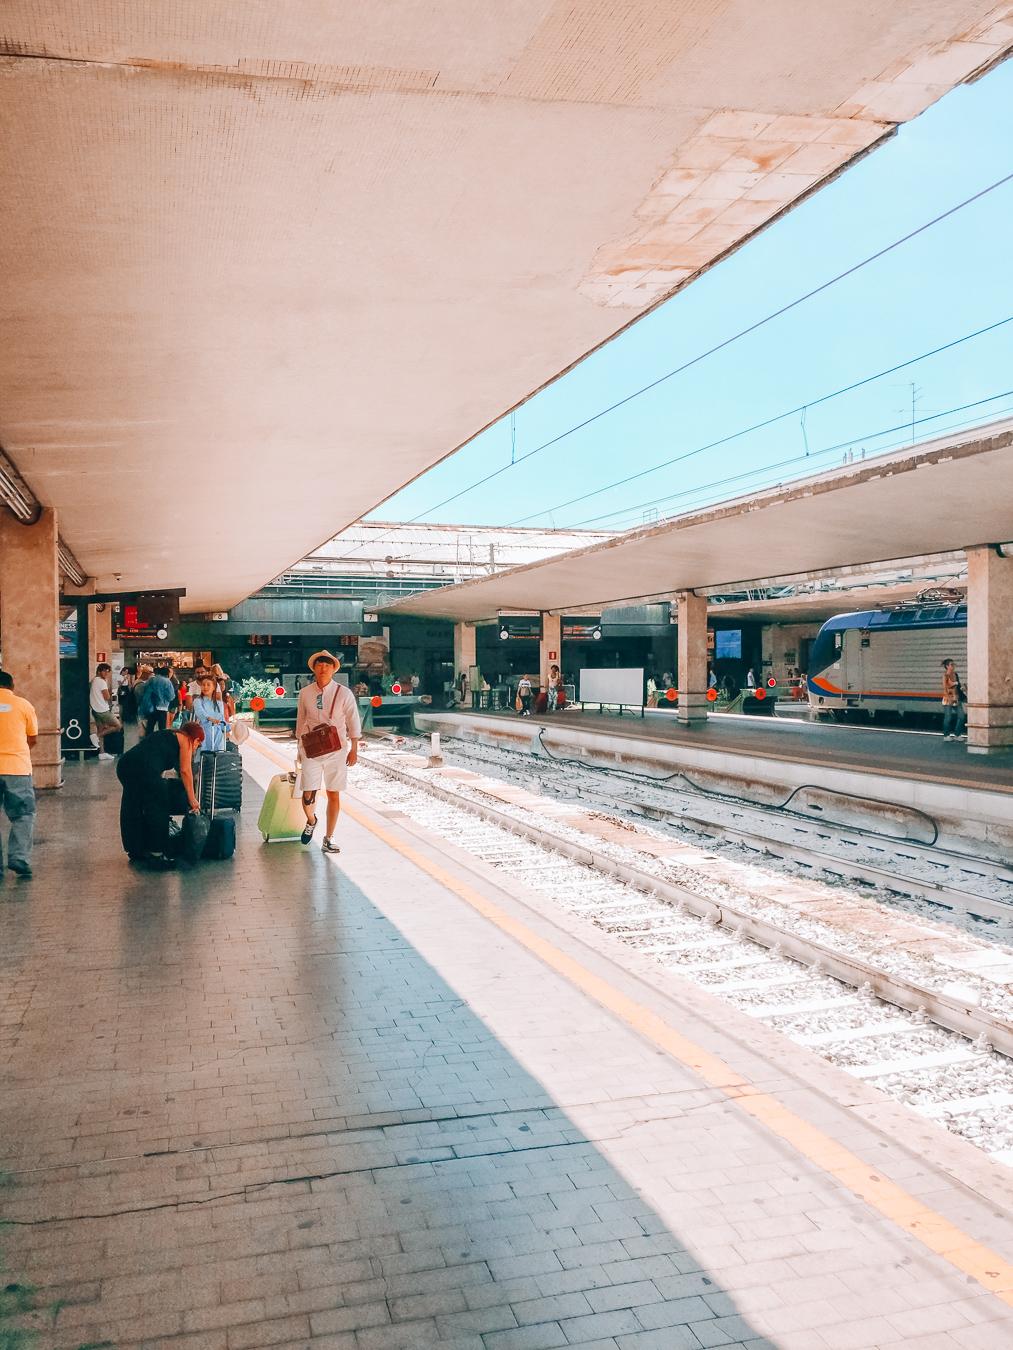 Train station Florence